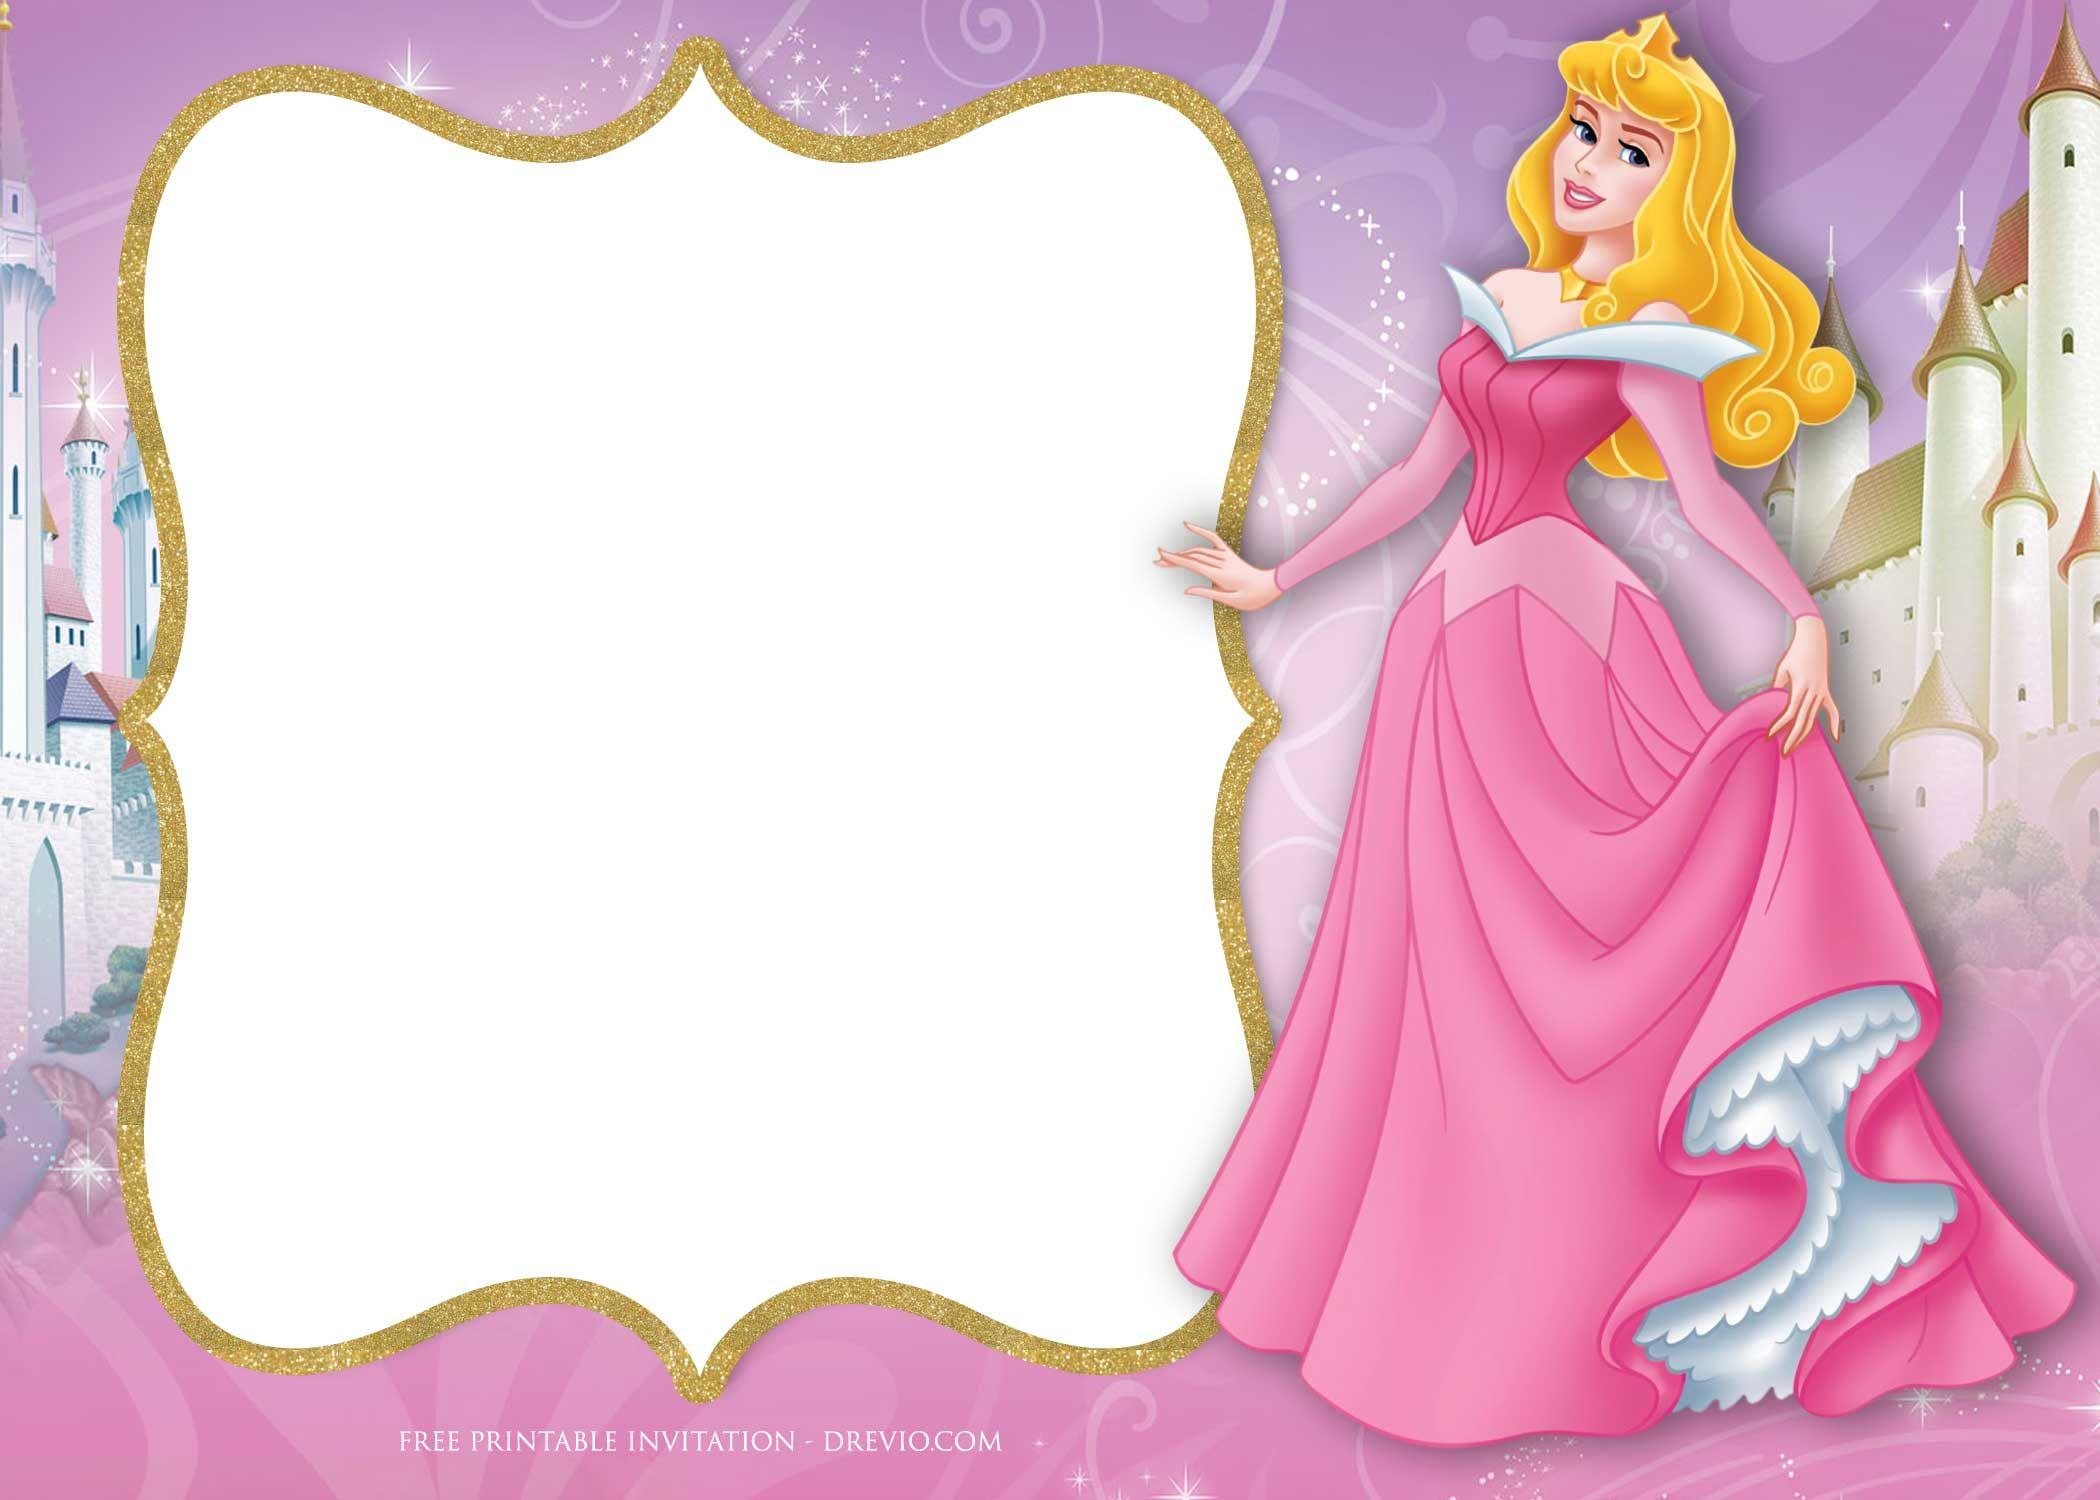 Free Printable Princess Aurora Sleeping Beauty Invitation - Free Printable Princess Invitations